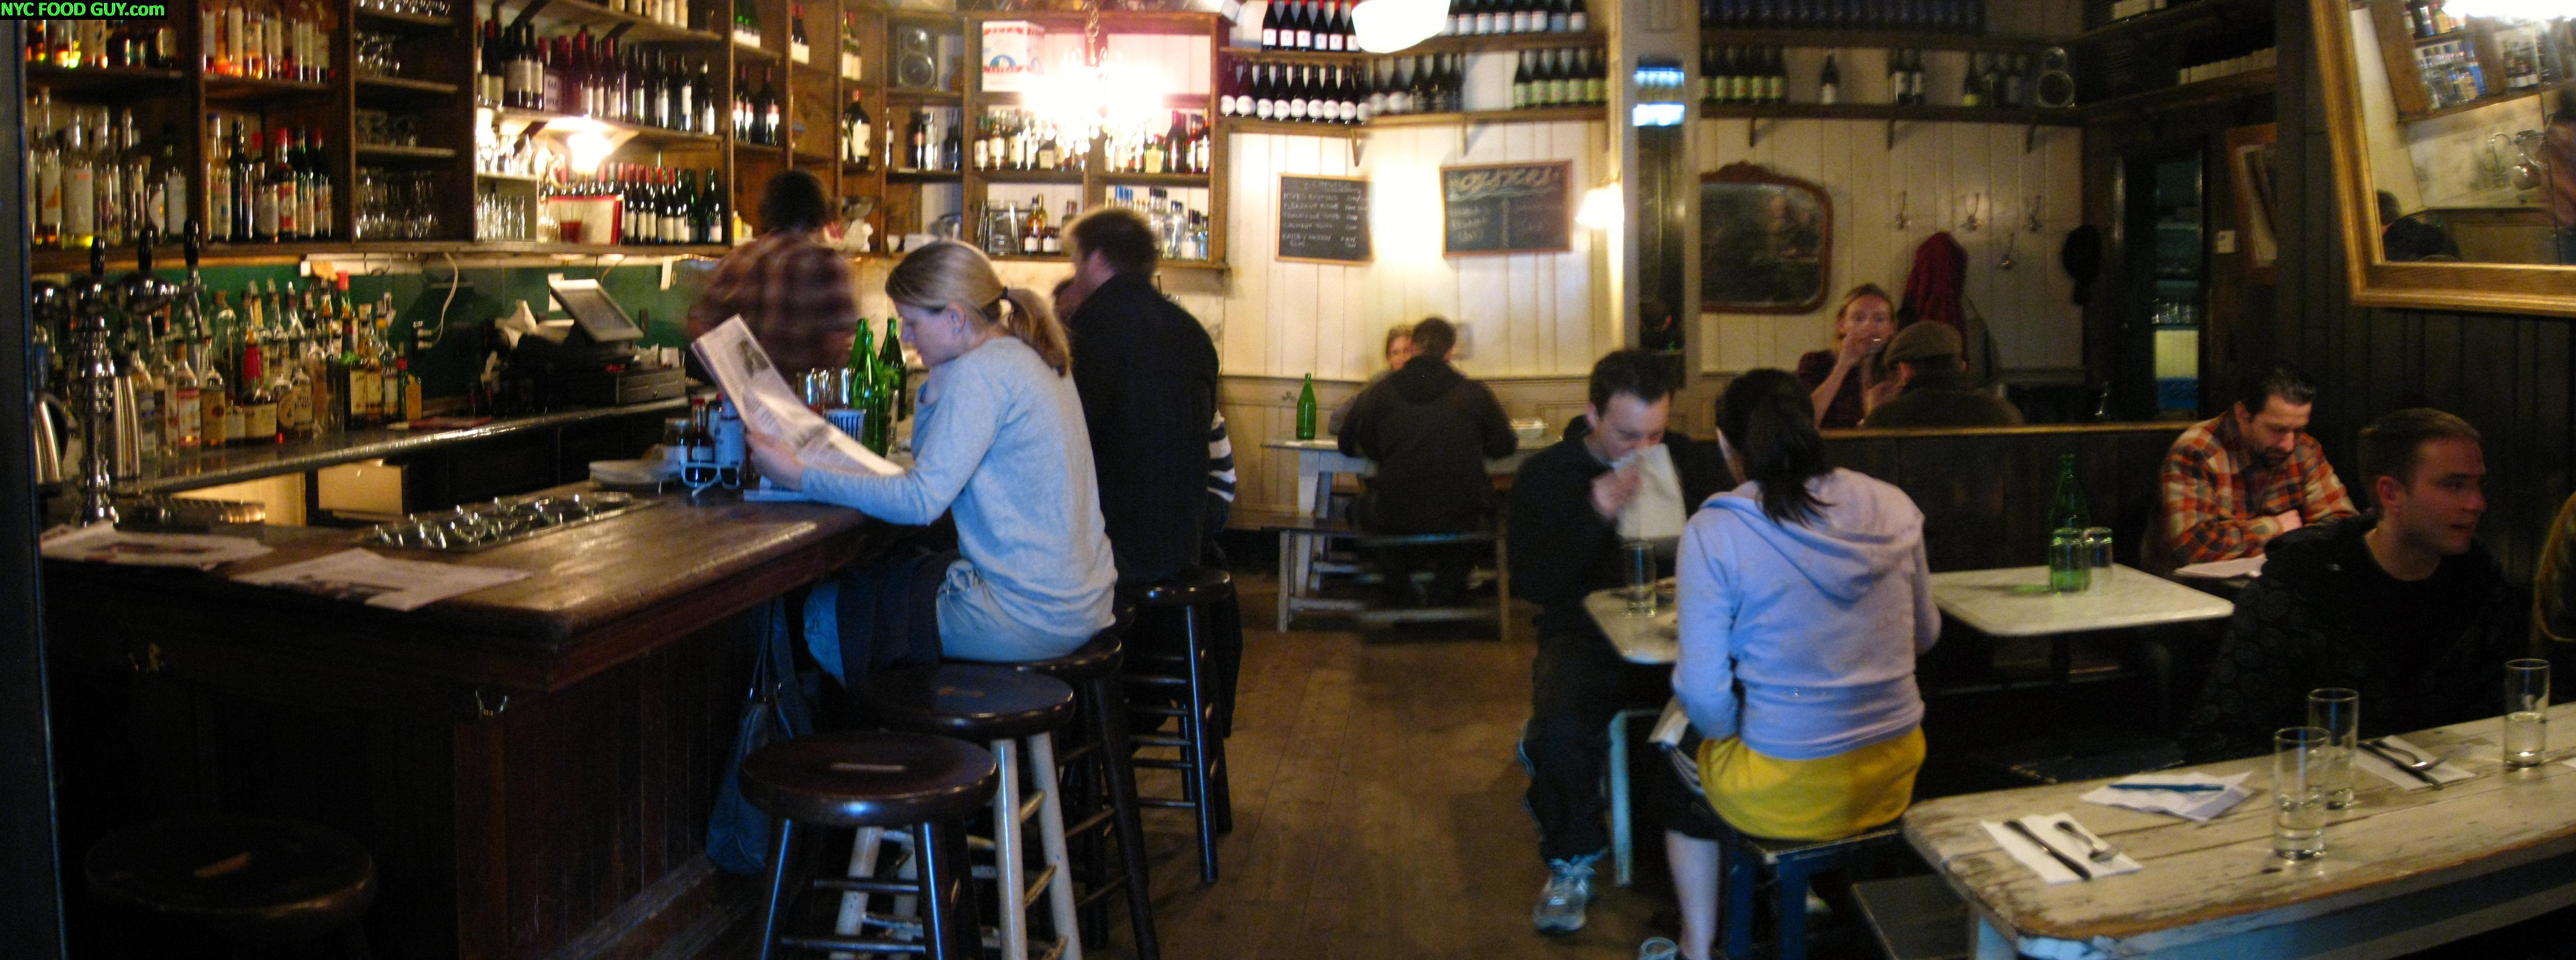 Marlow & Sons Dining Room Interior